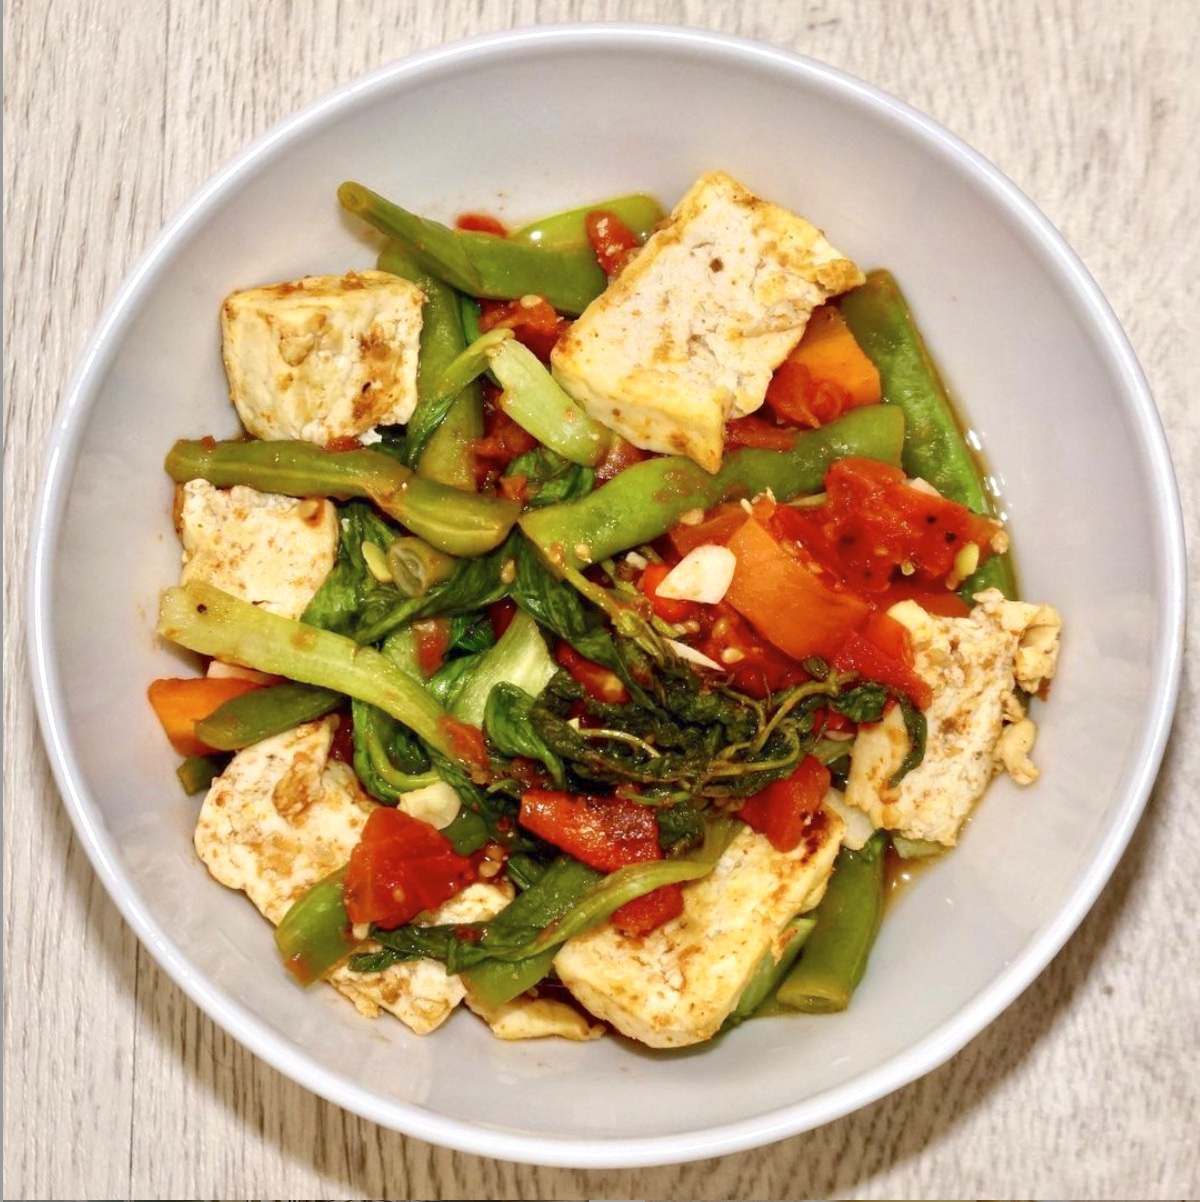 Stir-Fried Tofu with Mushrooms and Leafy Greens